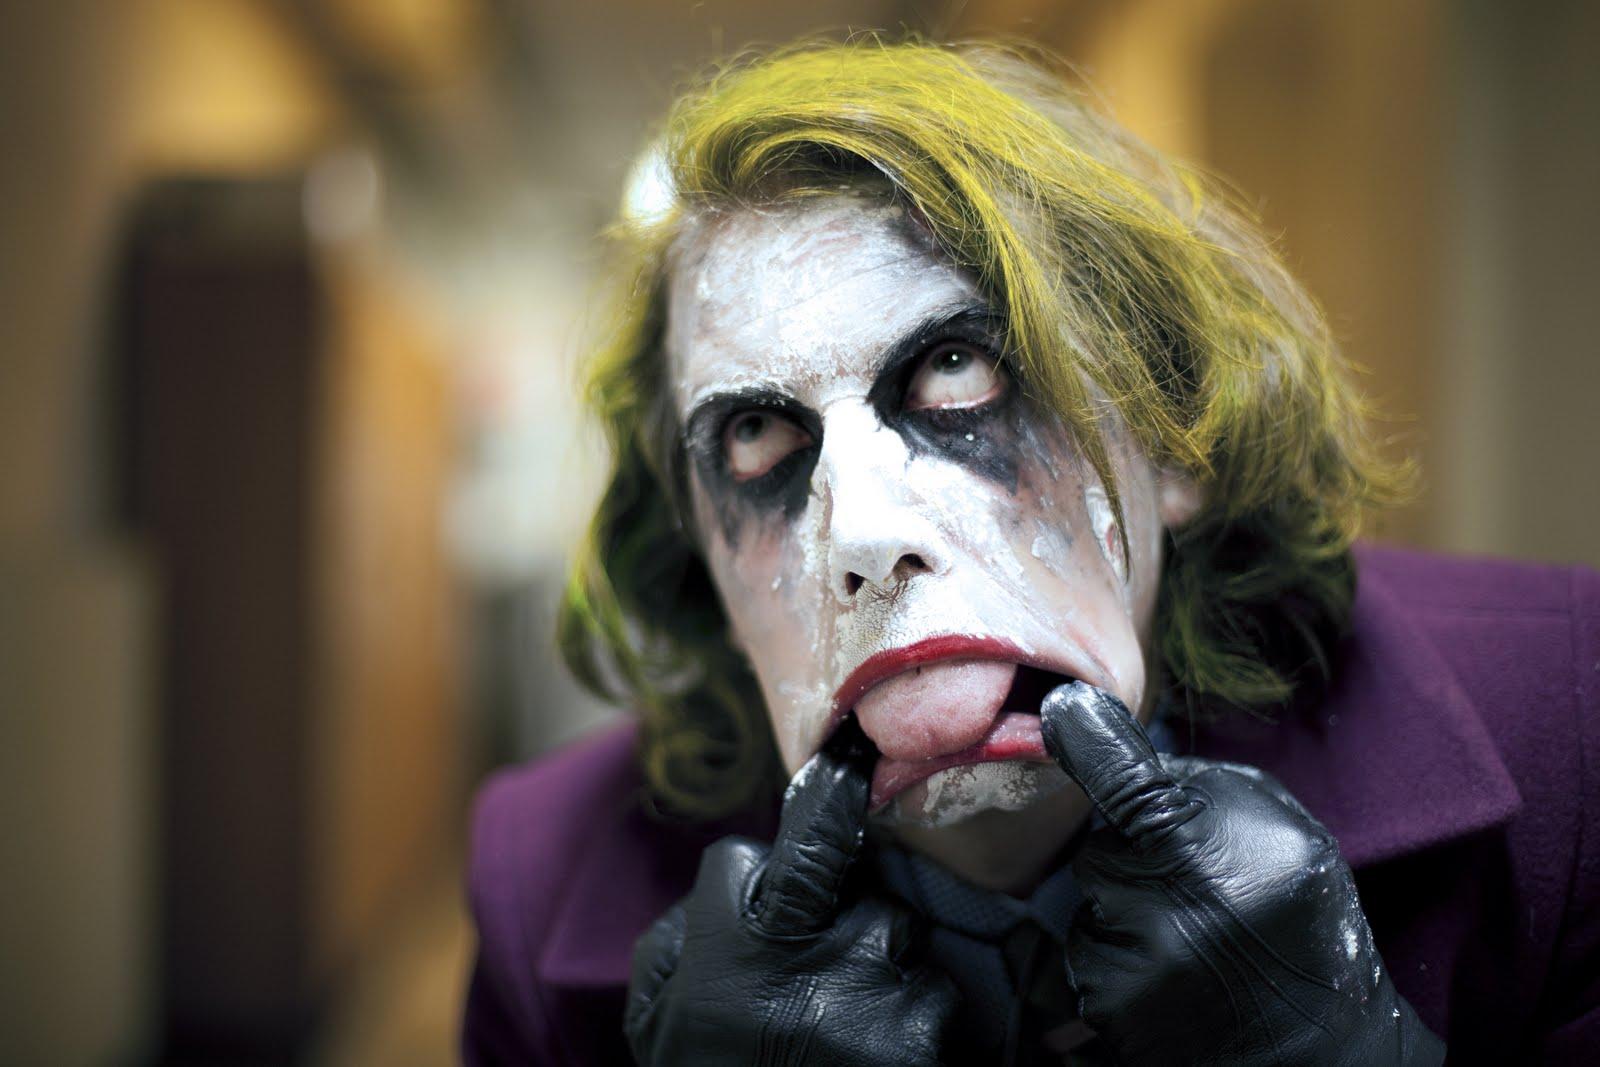 http://3.bp.blogspot.com/-VnZQG4uAMX8/TeNbiUiHx2I/AAAAAAAAD0o/-nnoq-bnzQQ/s1600/Joker_cosplay_costume.jpg